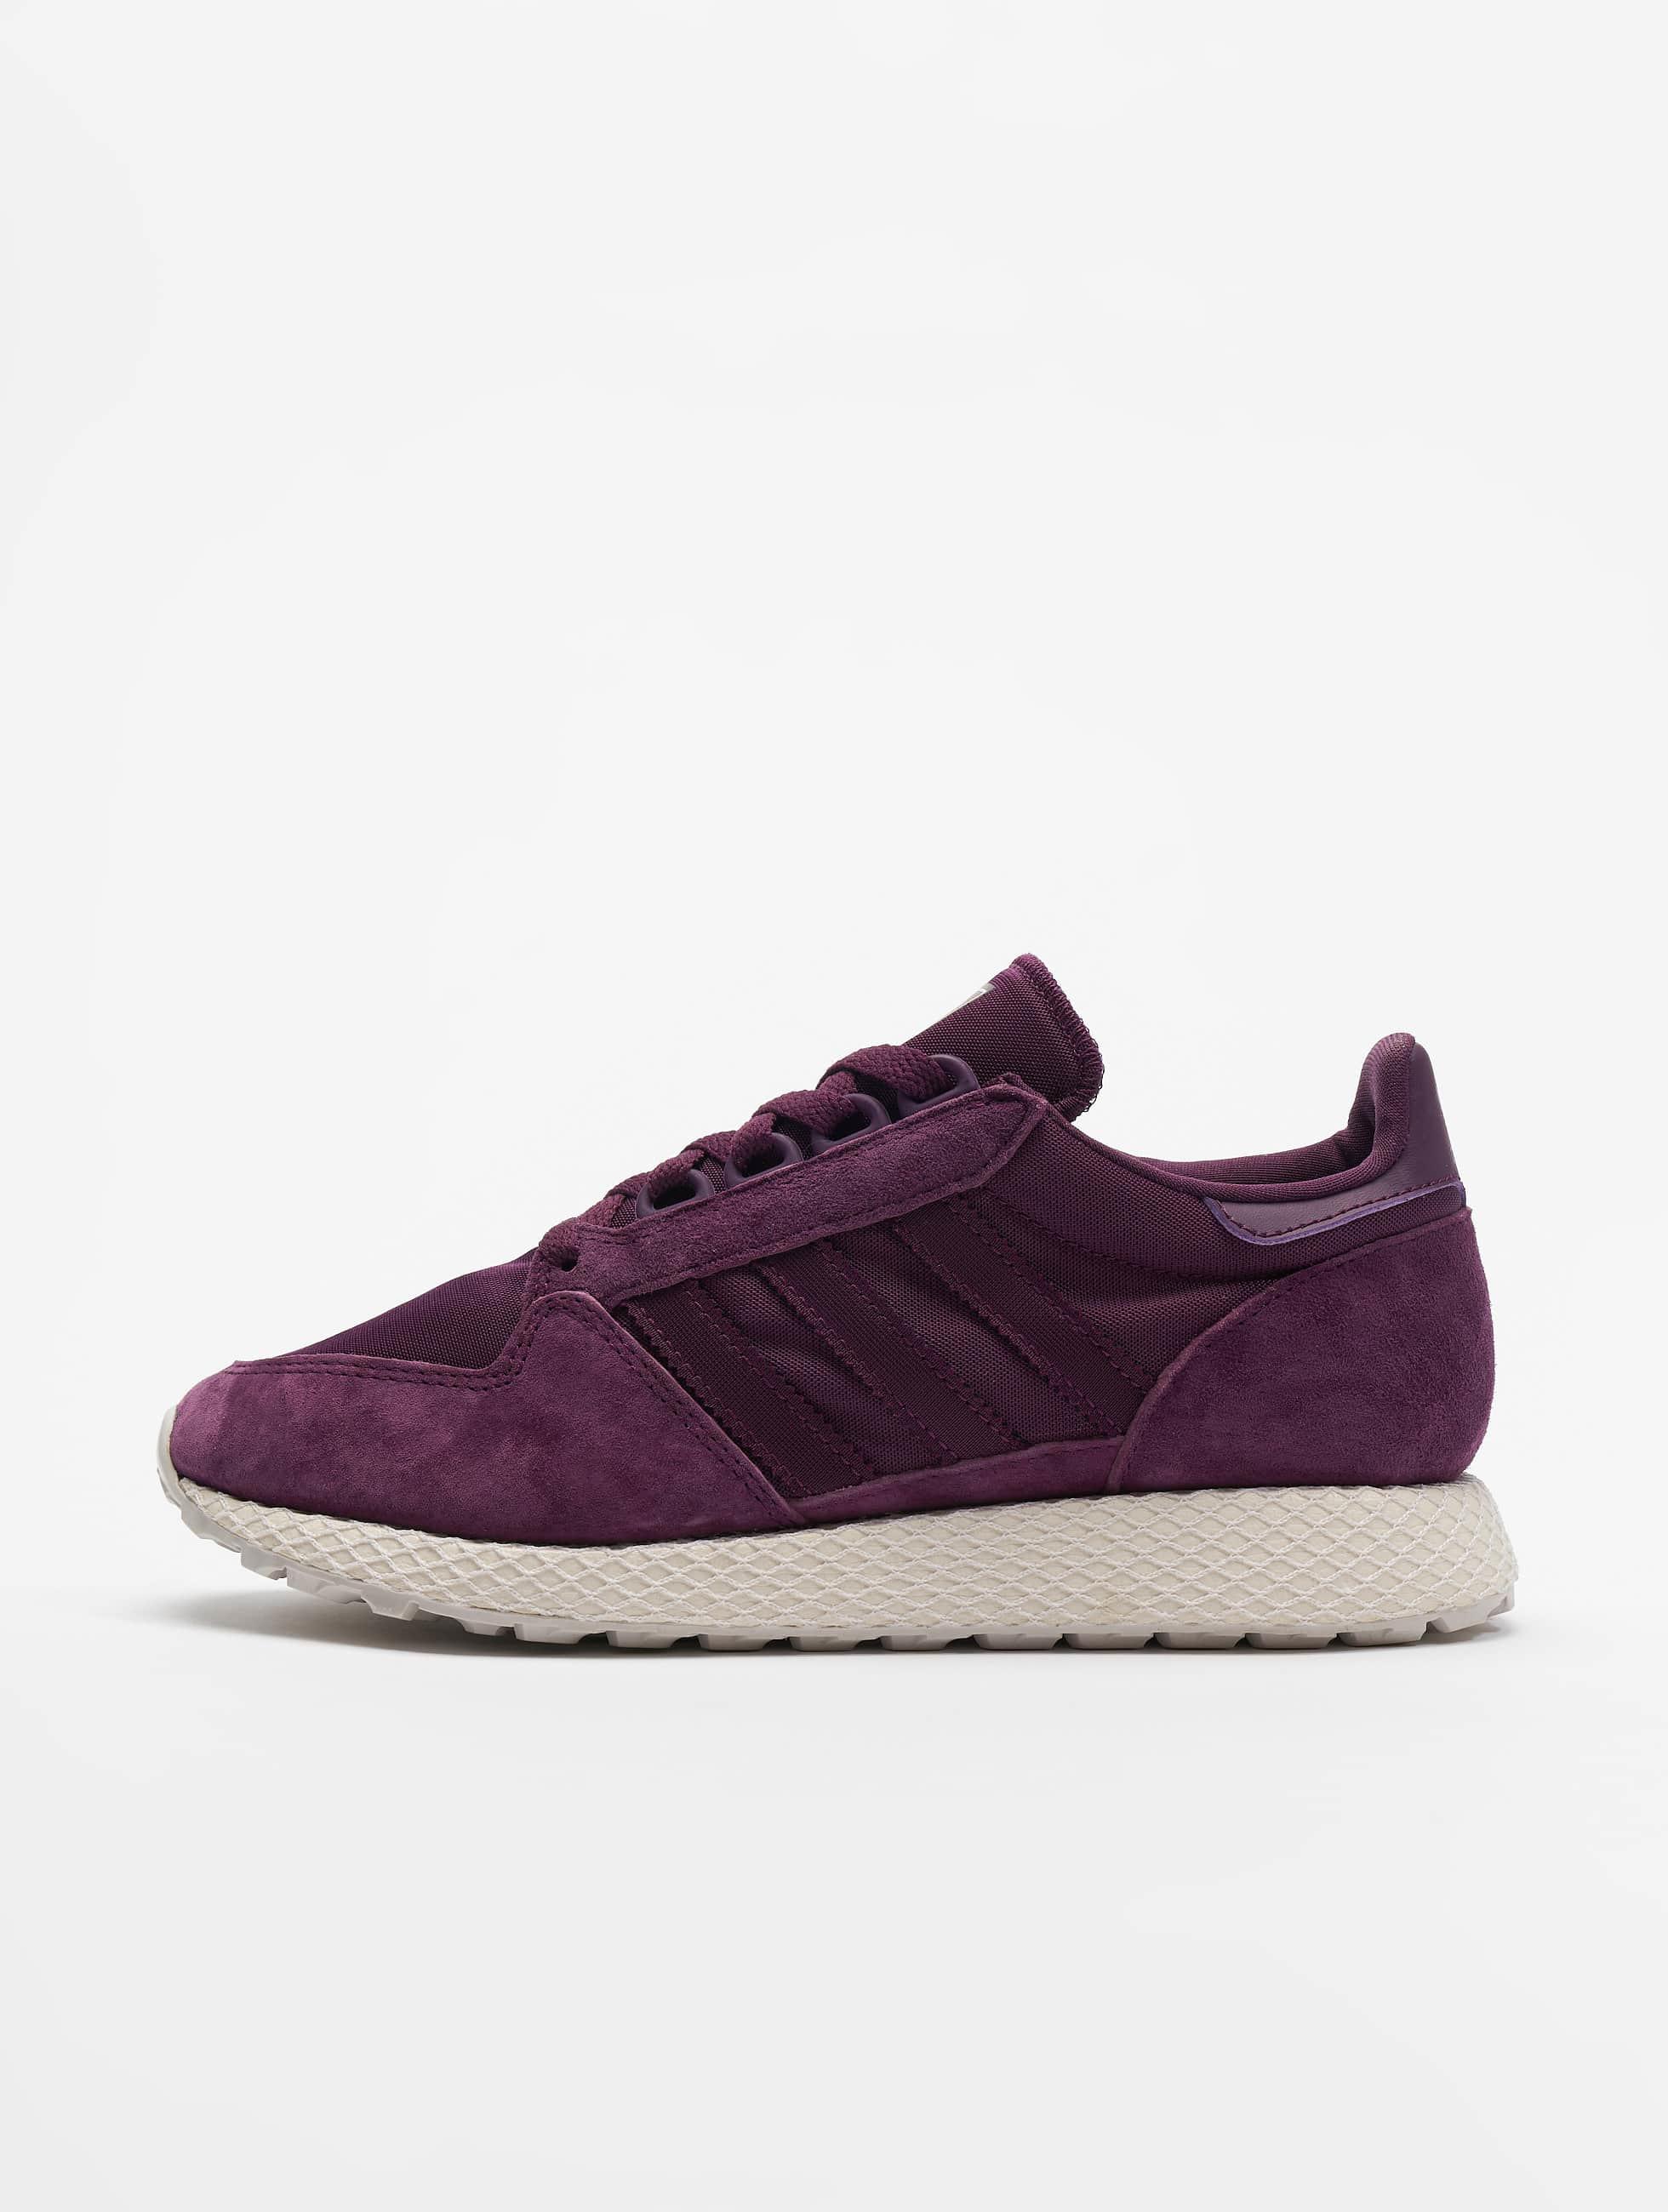 c84a223291a adidas originals schoen / sneaker Forest Grove in paars 575007